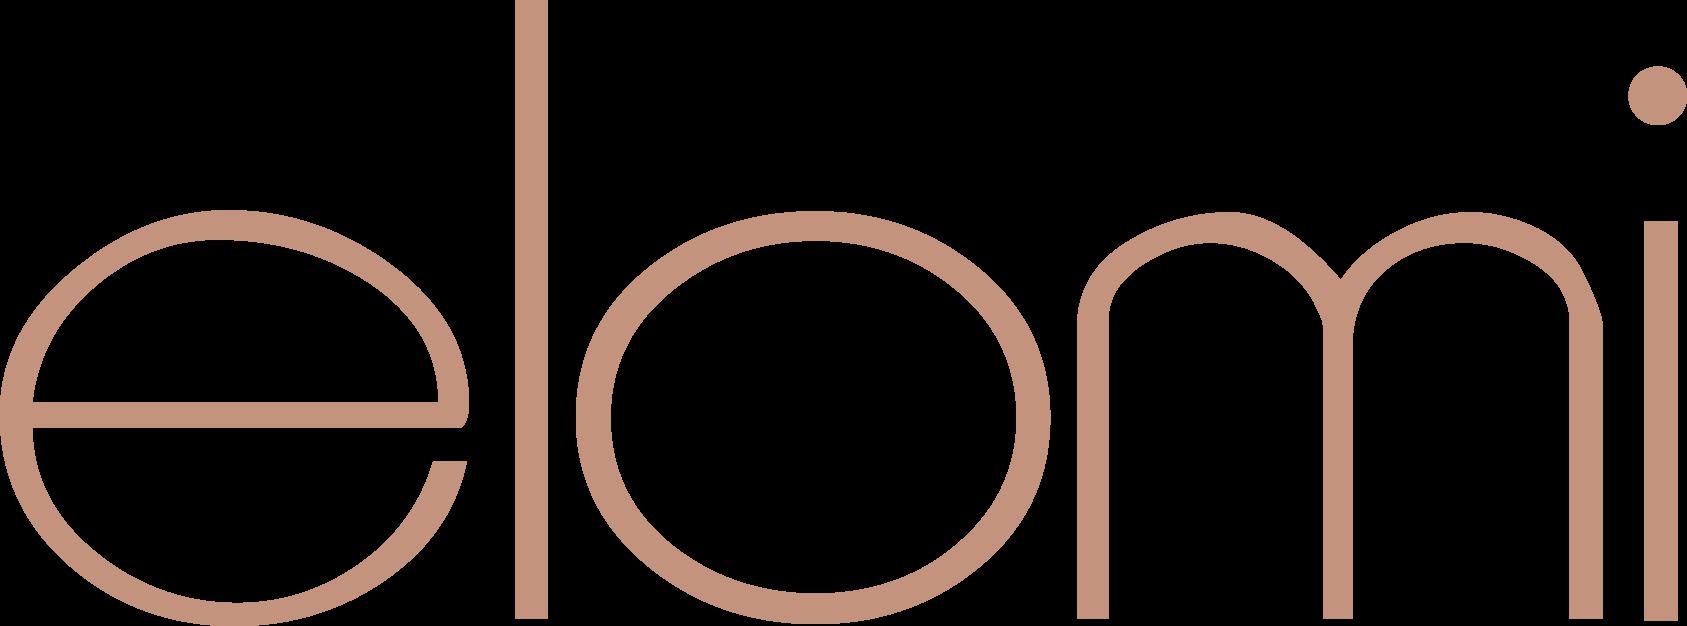 https://dopasowana.pl/wp-content/uploads/2019/07/Elomi-Logo.png